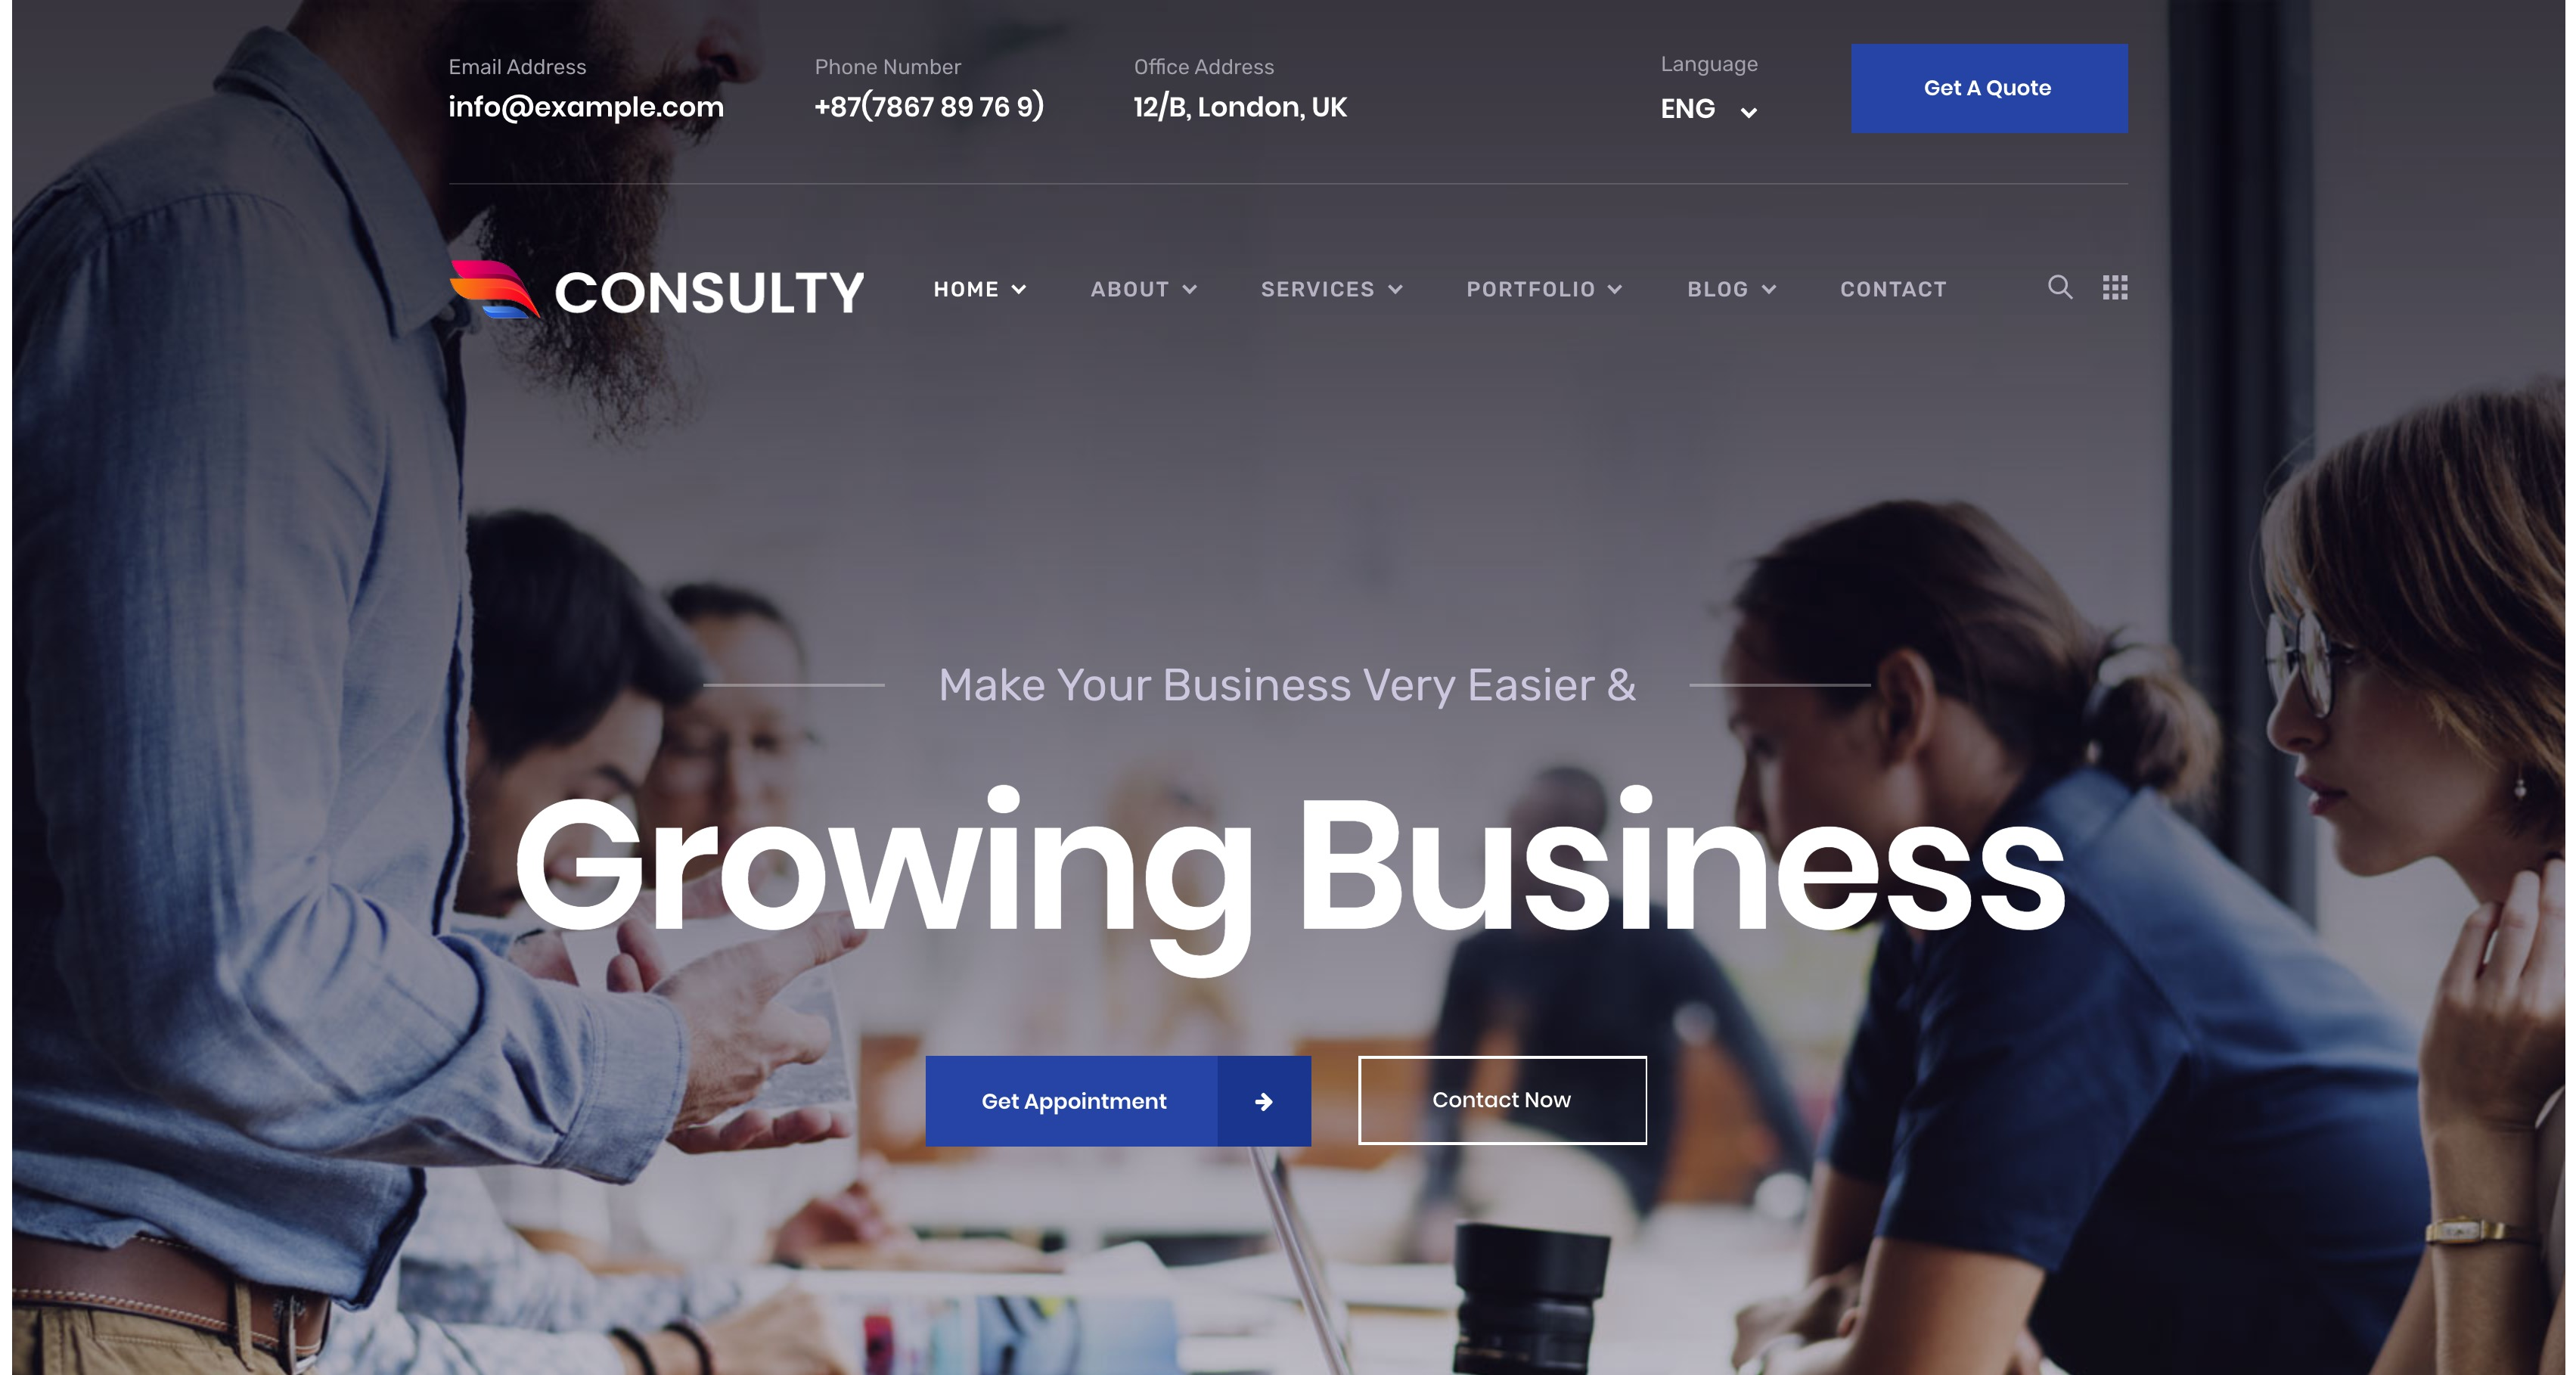 Consulty-商业投资咨询金融保险WordPress主题